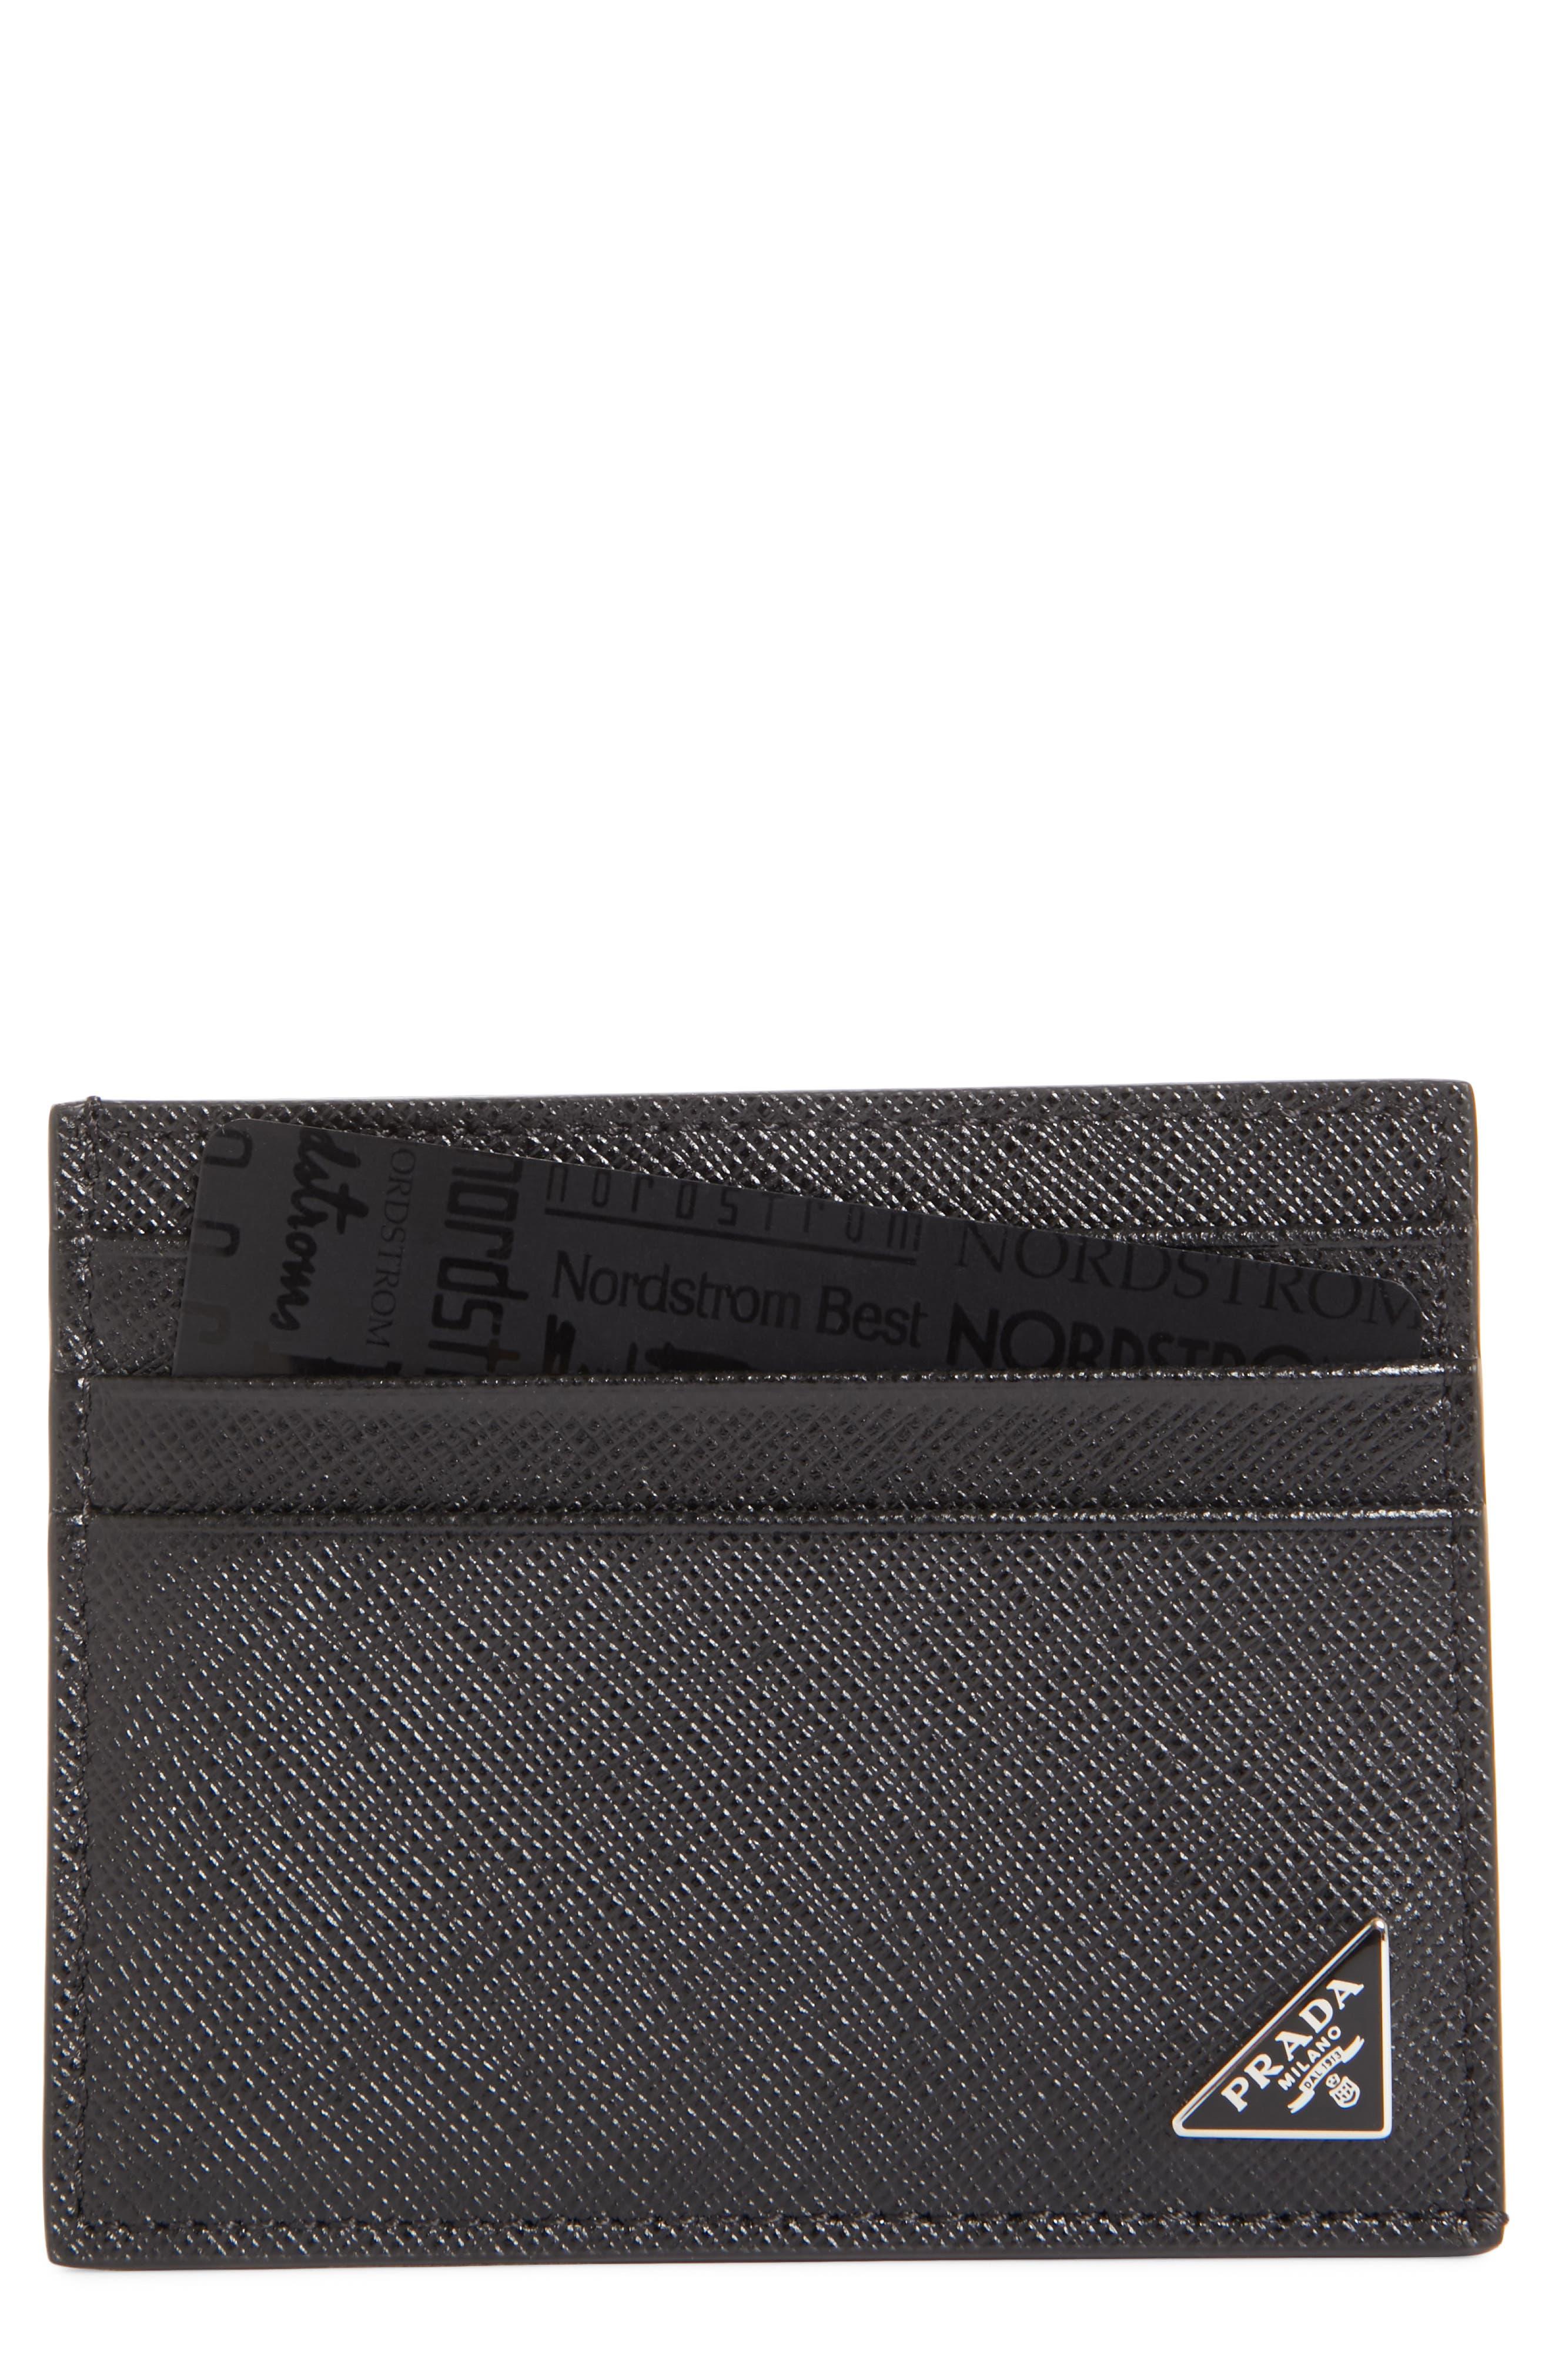 4513a87286ee Men's Prada Wallets | Nordstrom